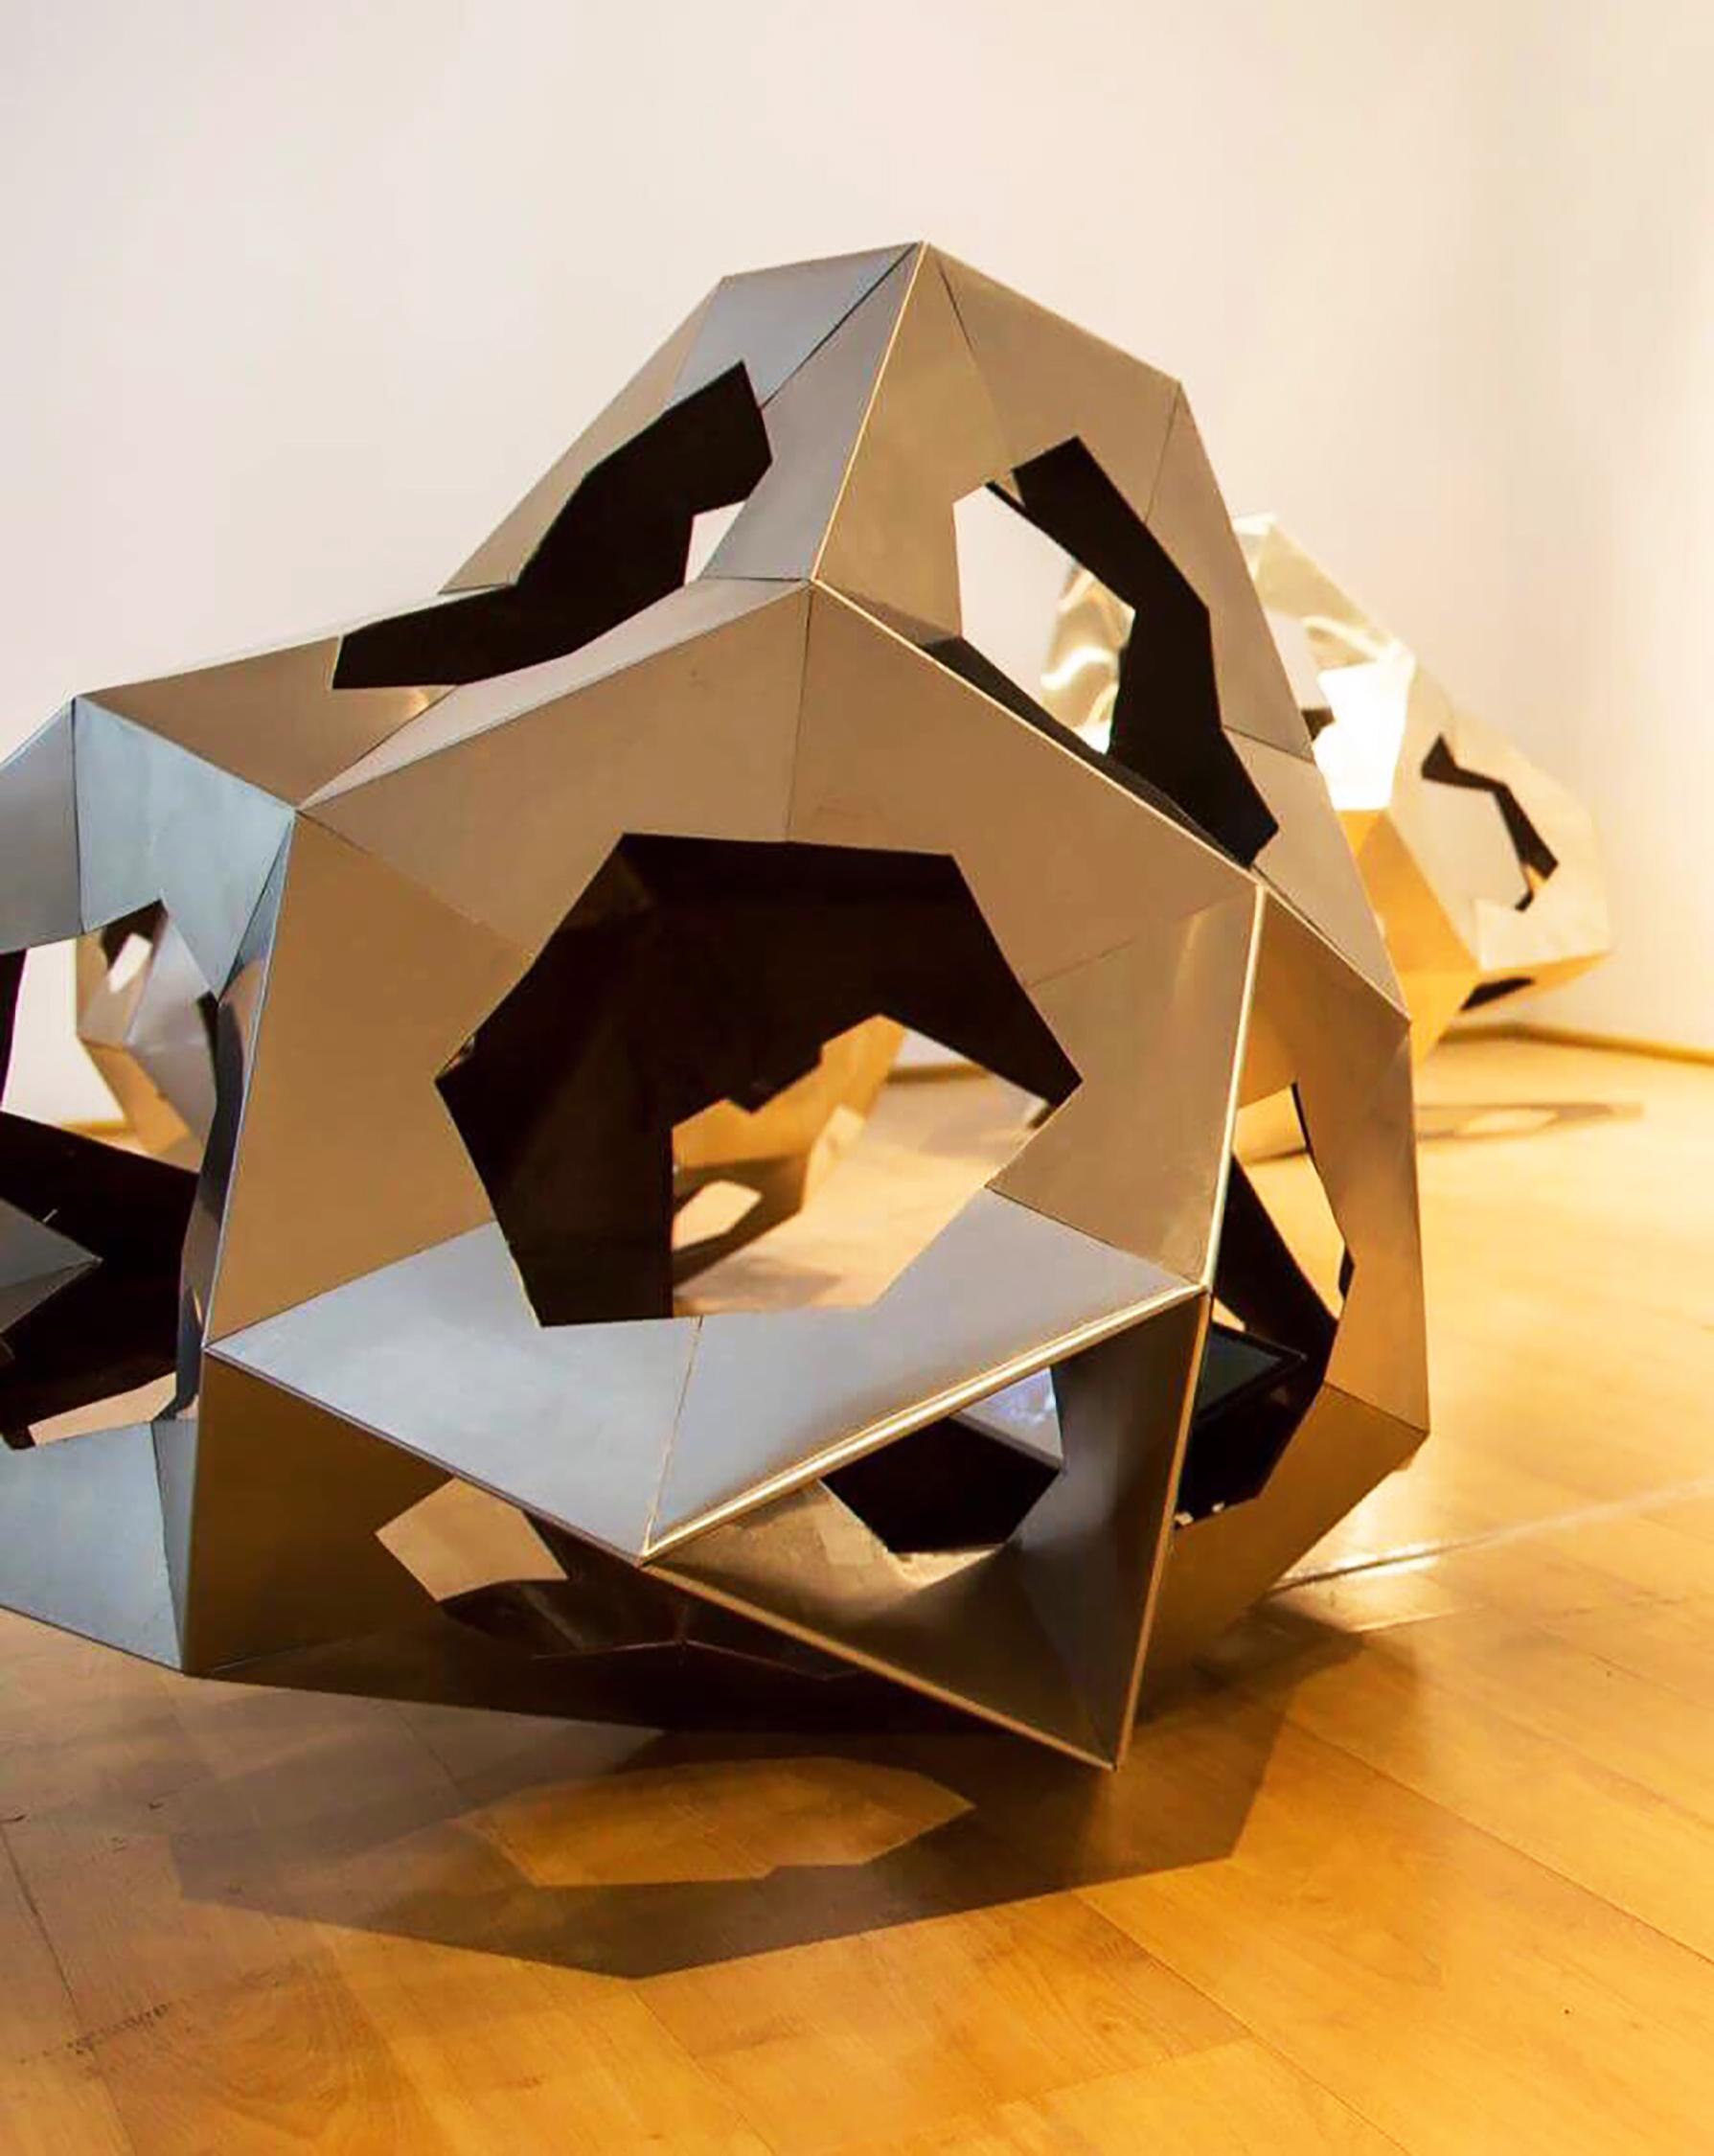 1 Ecosistema Tetraedro.jpg